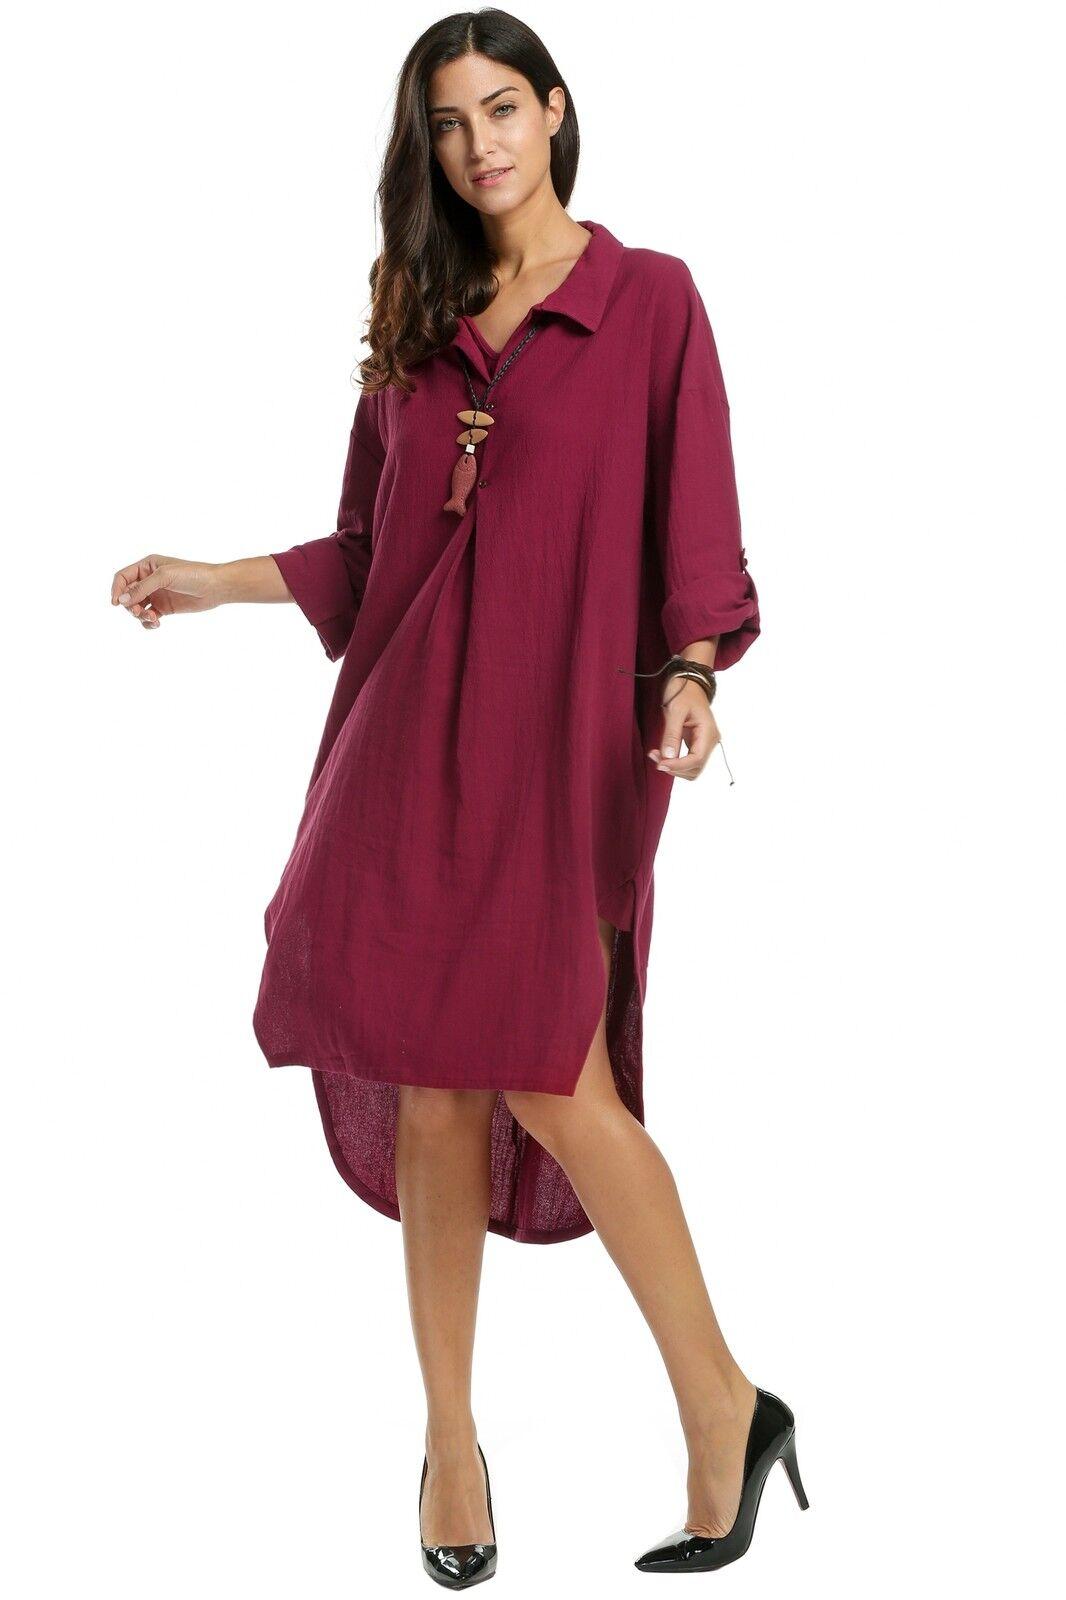 06f56b97420 Dress women s dress maxy jersey comfortable red élégant long sleeves 3243